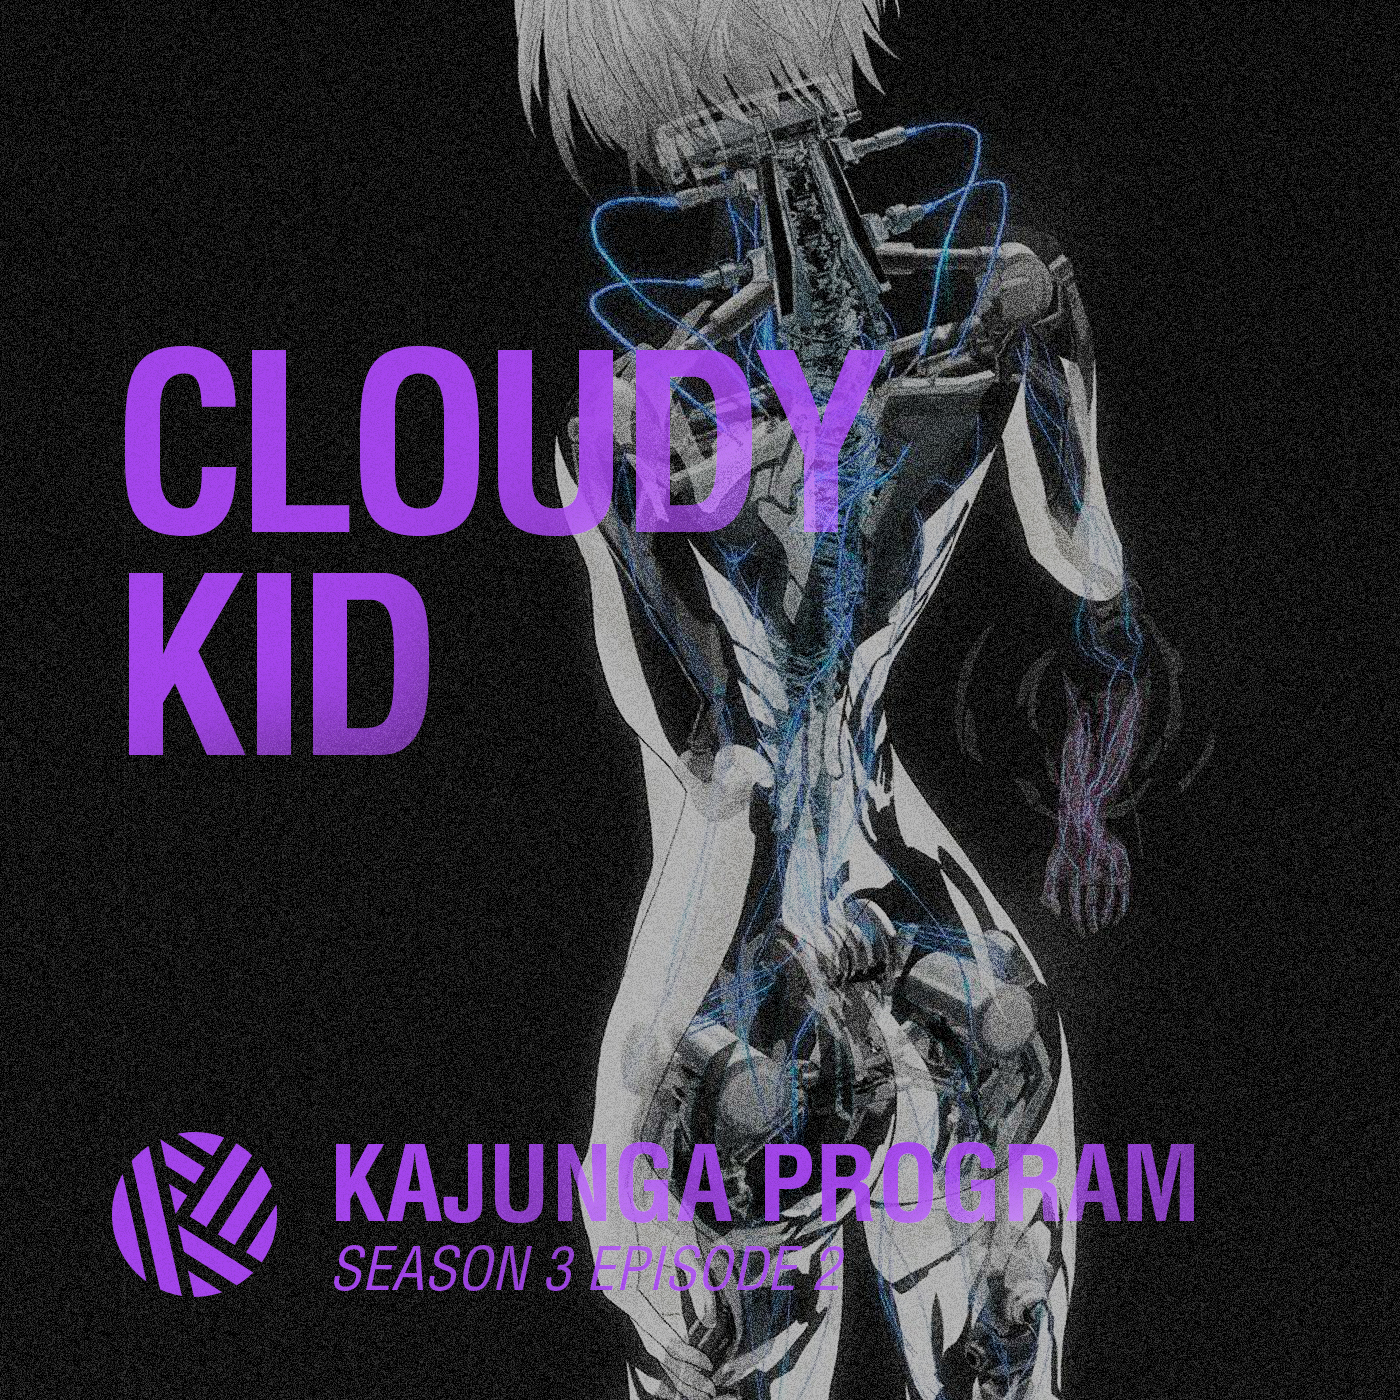 Kajunga_Program_Layout_CloudyKid-3.jpg